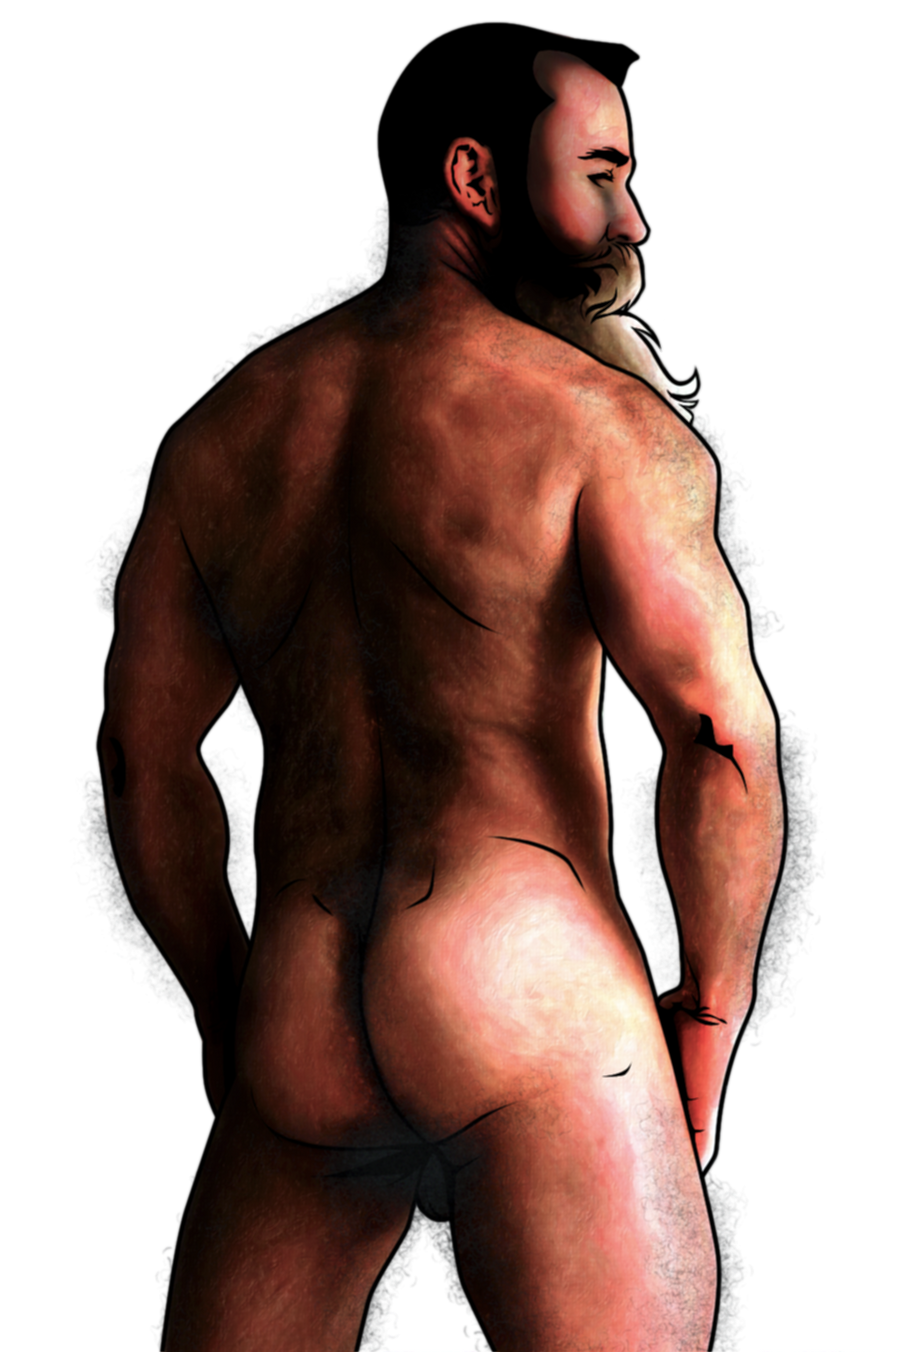 Hot bearded daddy color by Ursobaramanga